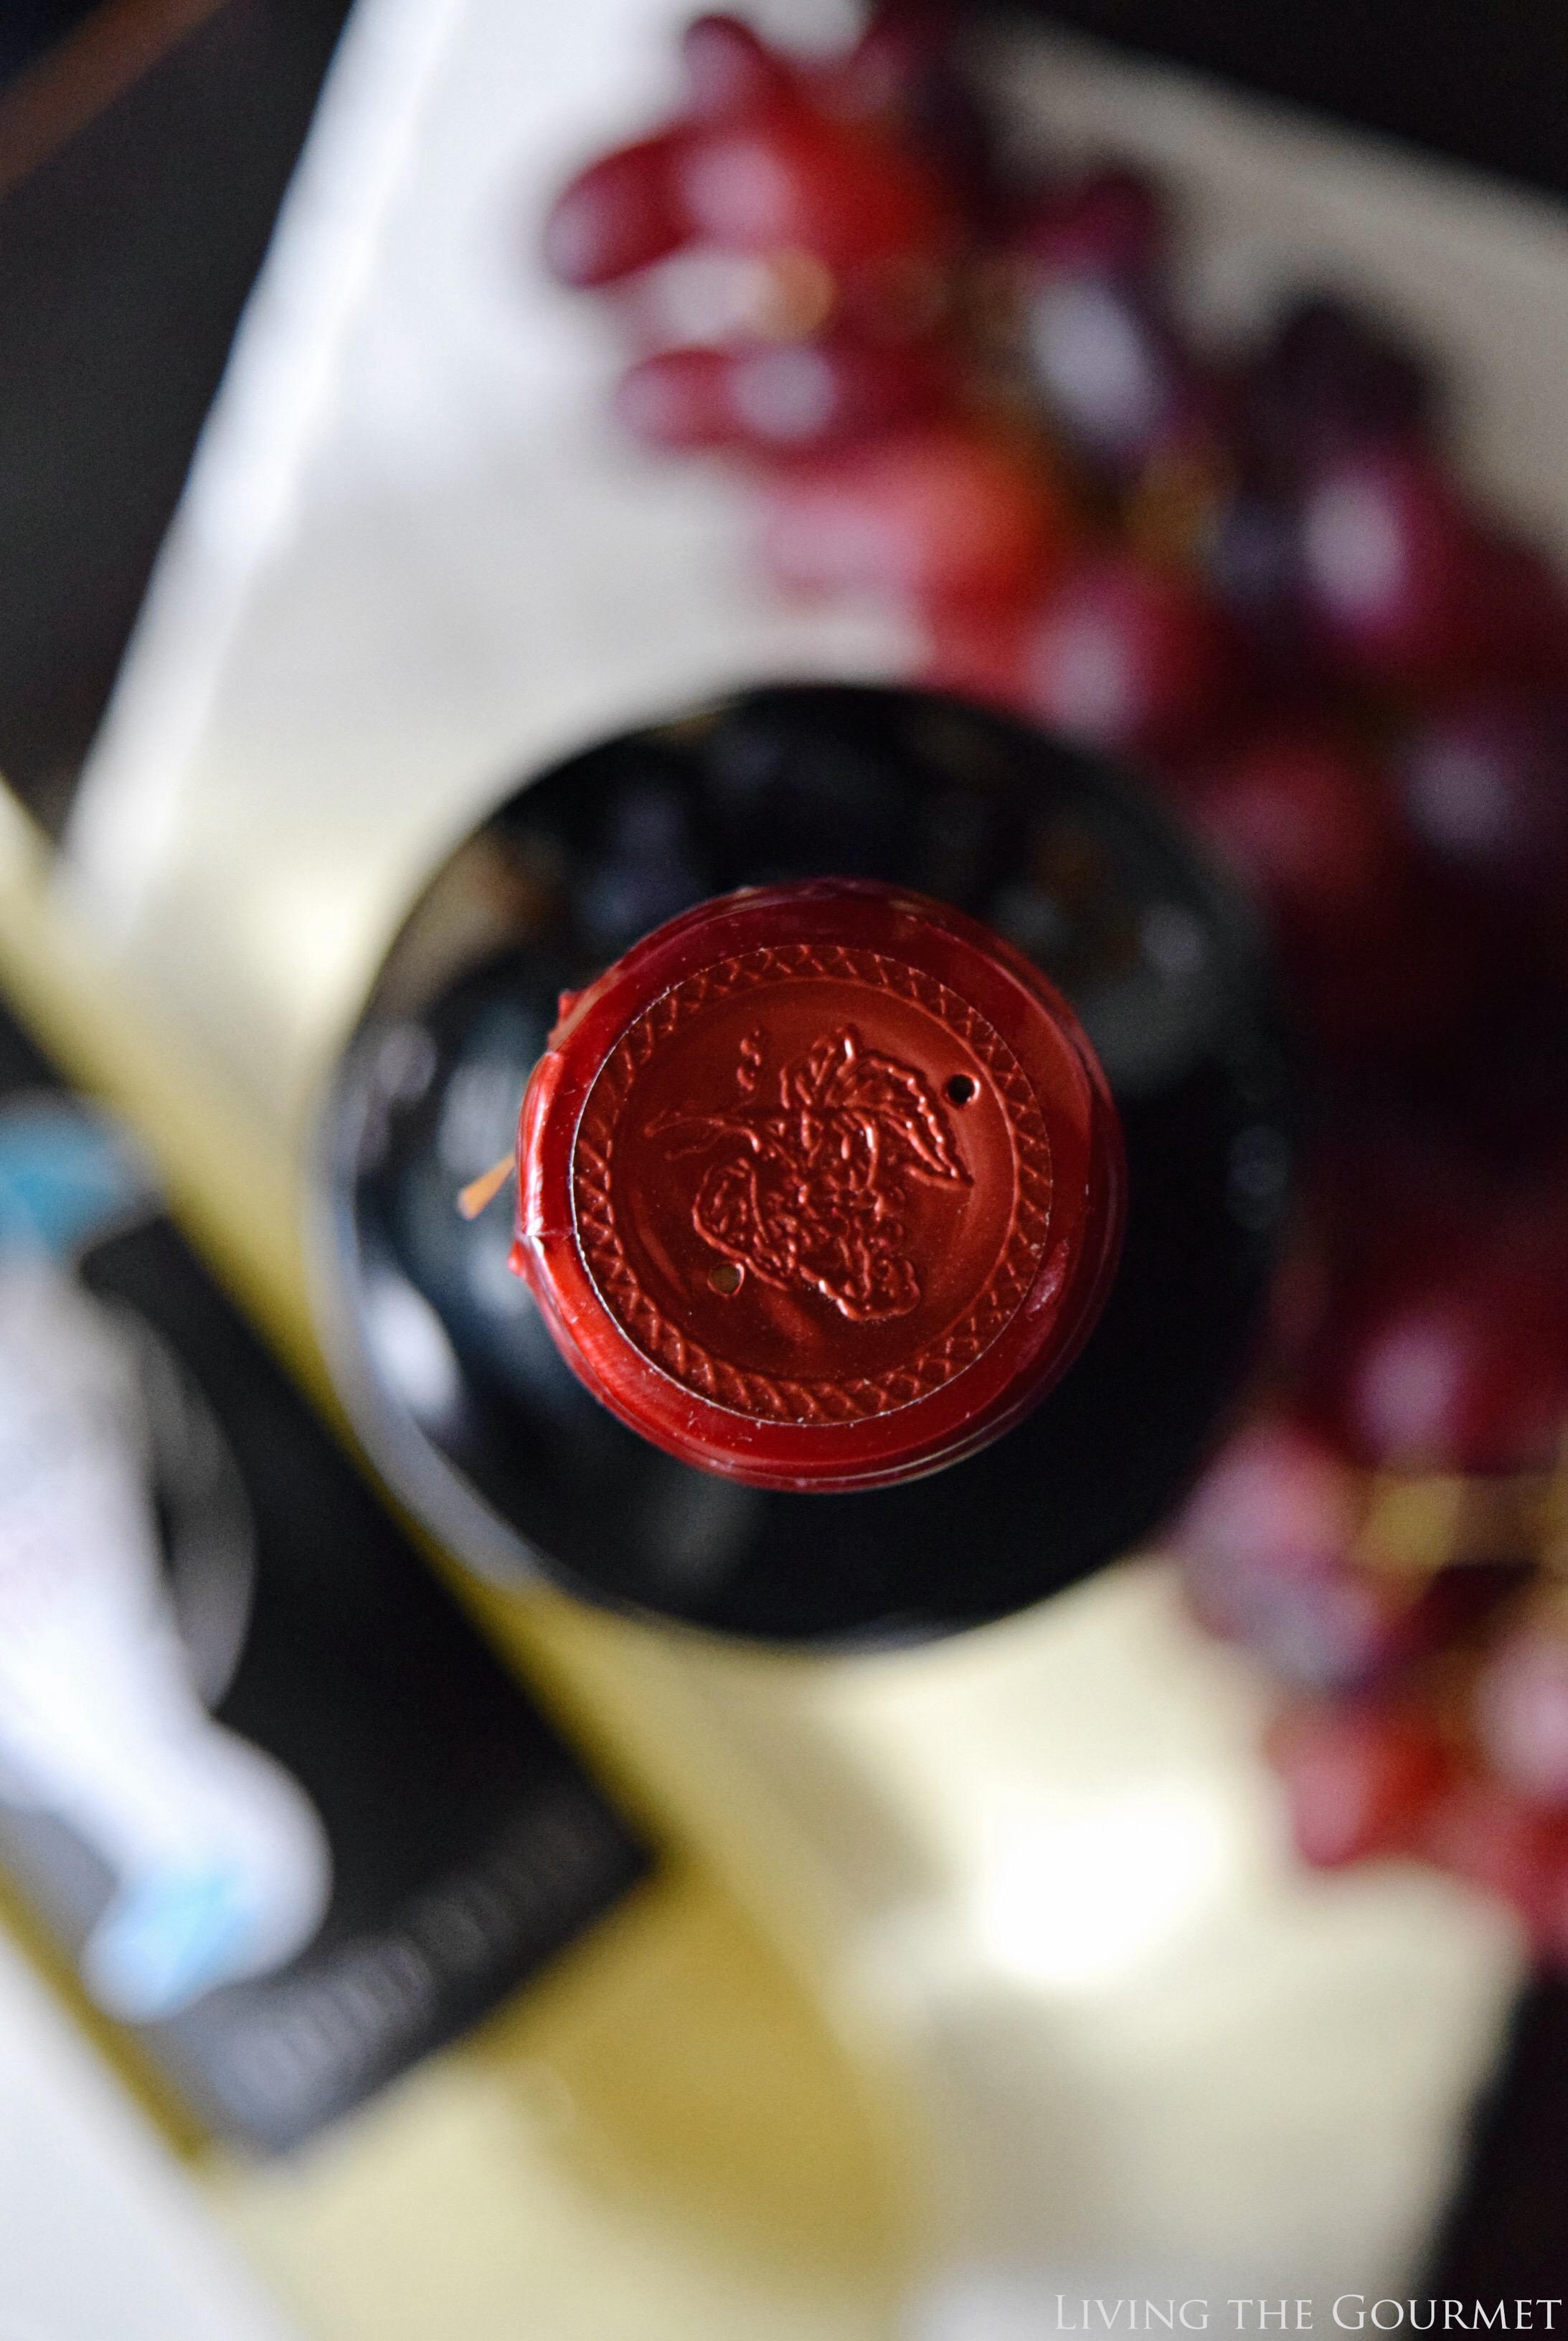 Living the Gourmet: Introducing Montana Winery